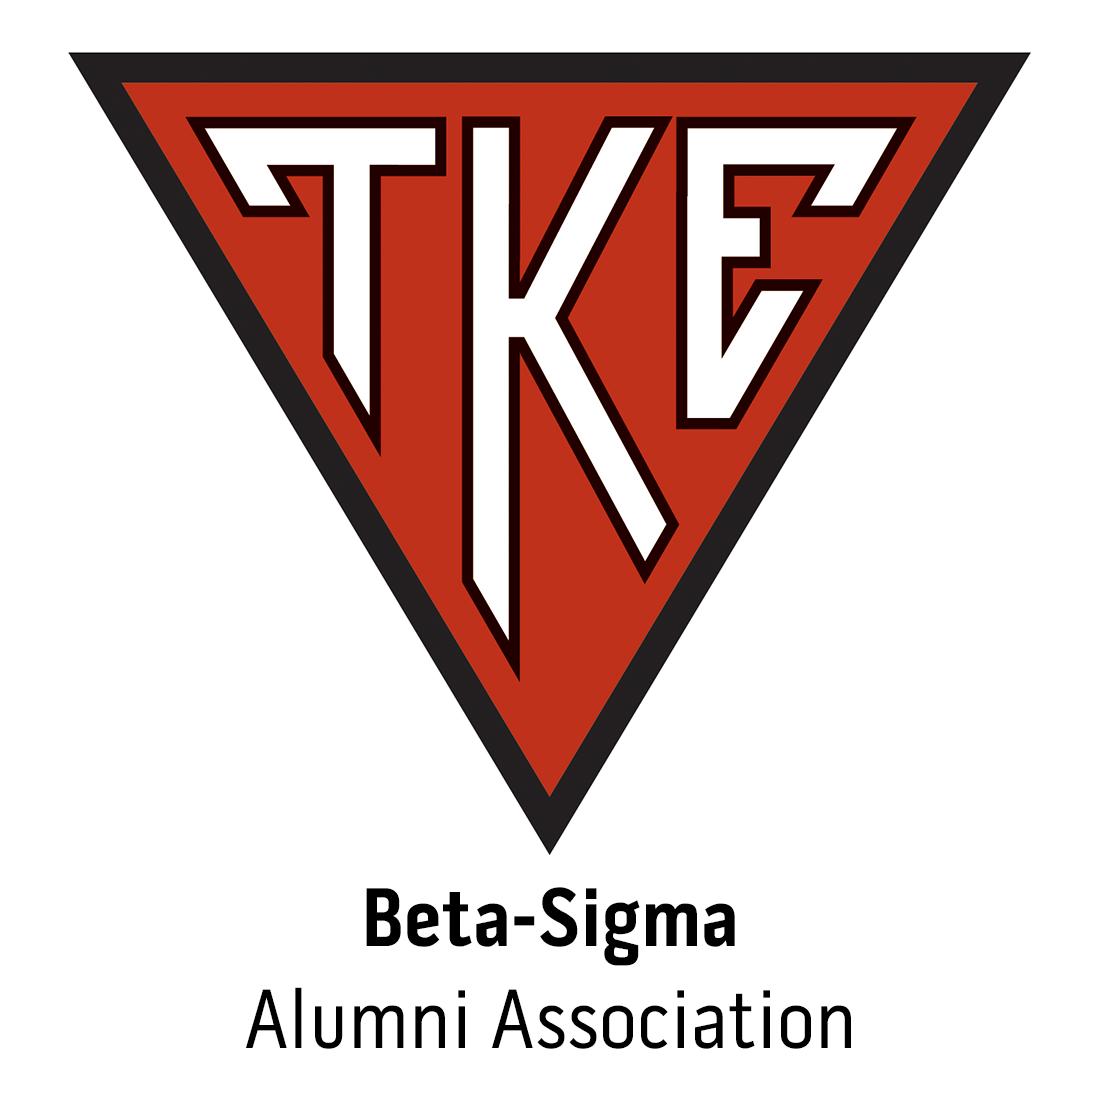 Beta-Sigma Alumni Association at University of Southern California